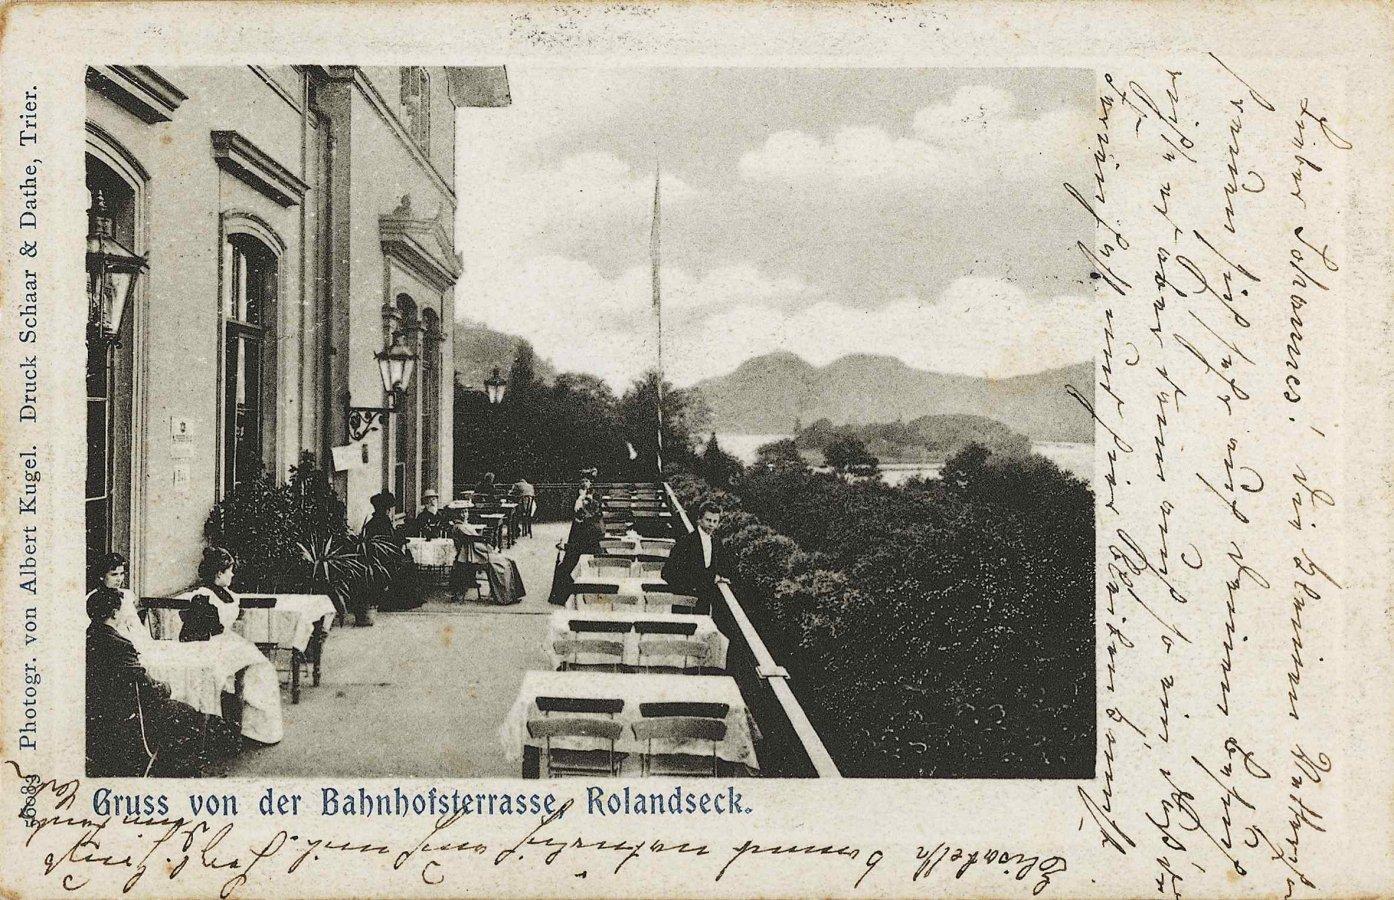 Historic postcard of the Bahnhof Rolandseck © Arp Museum Bahnhof Rolandseck